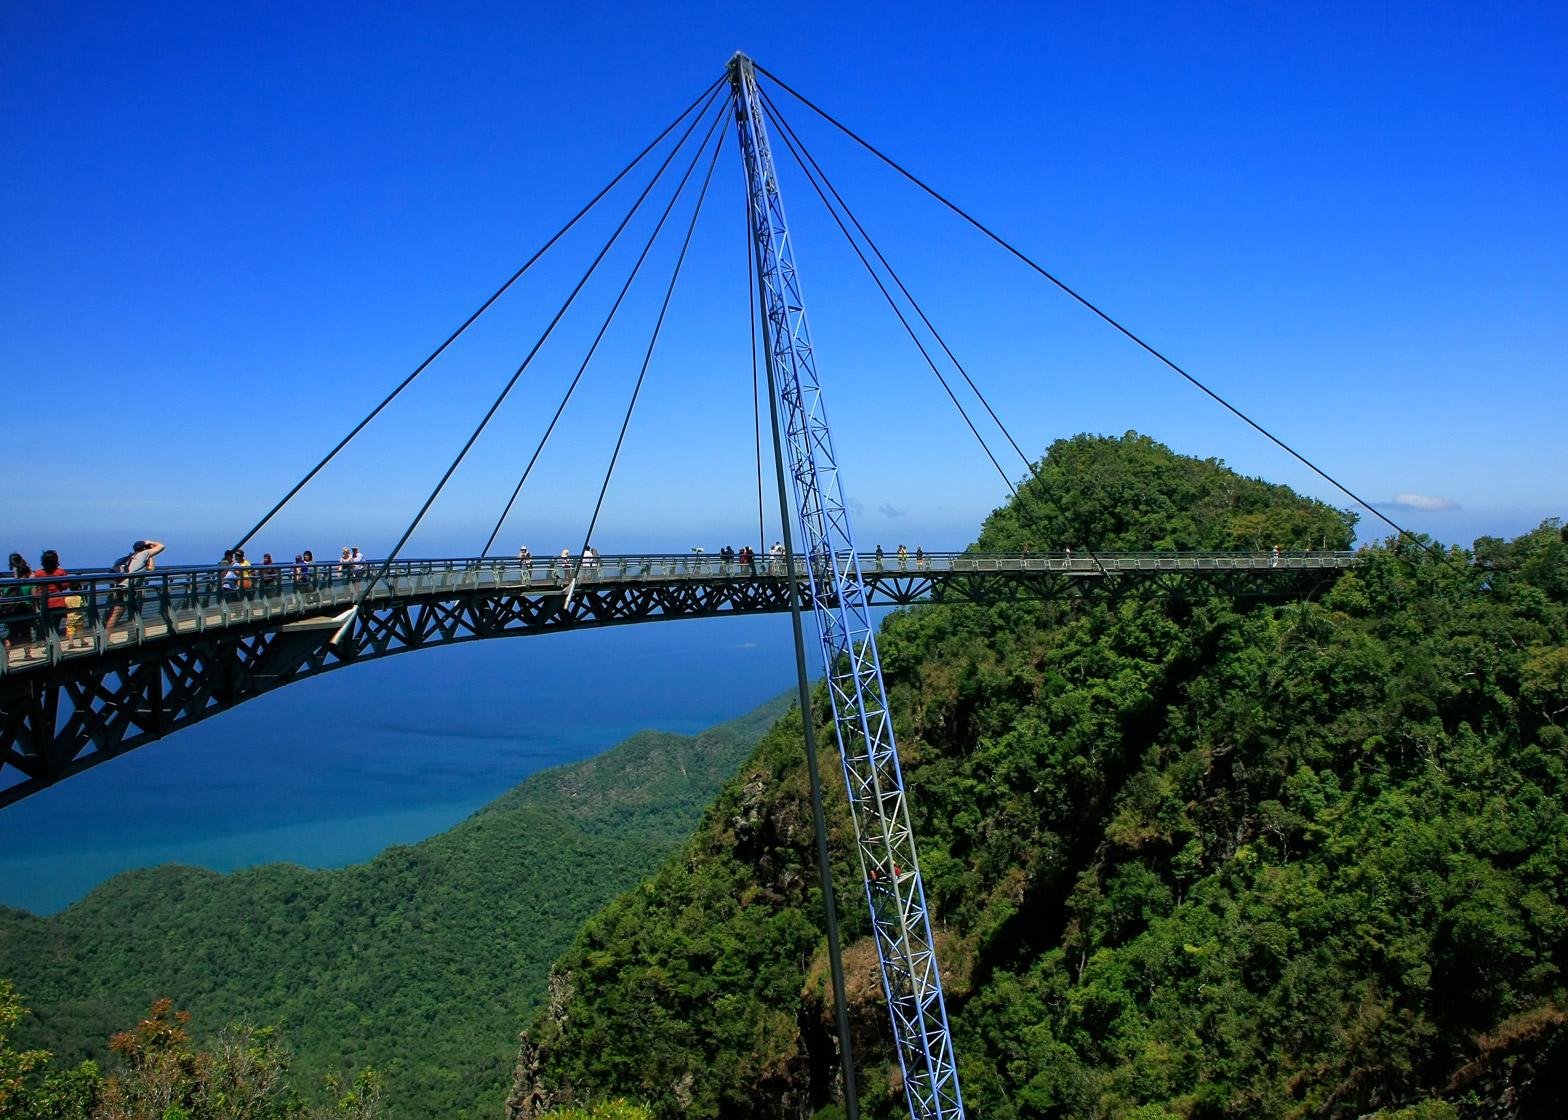 A-Zdvent calendar: Langkawi Sky Bridge by Peter Wyss